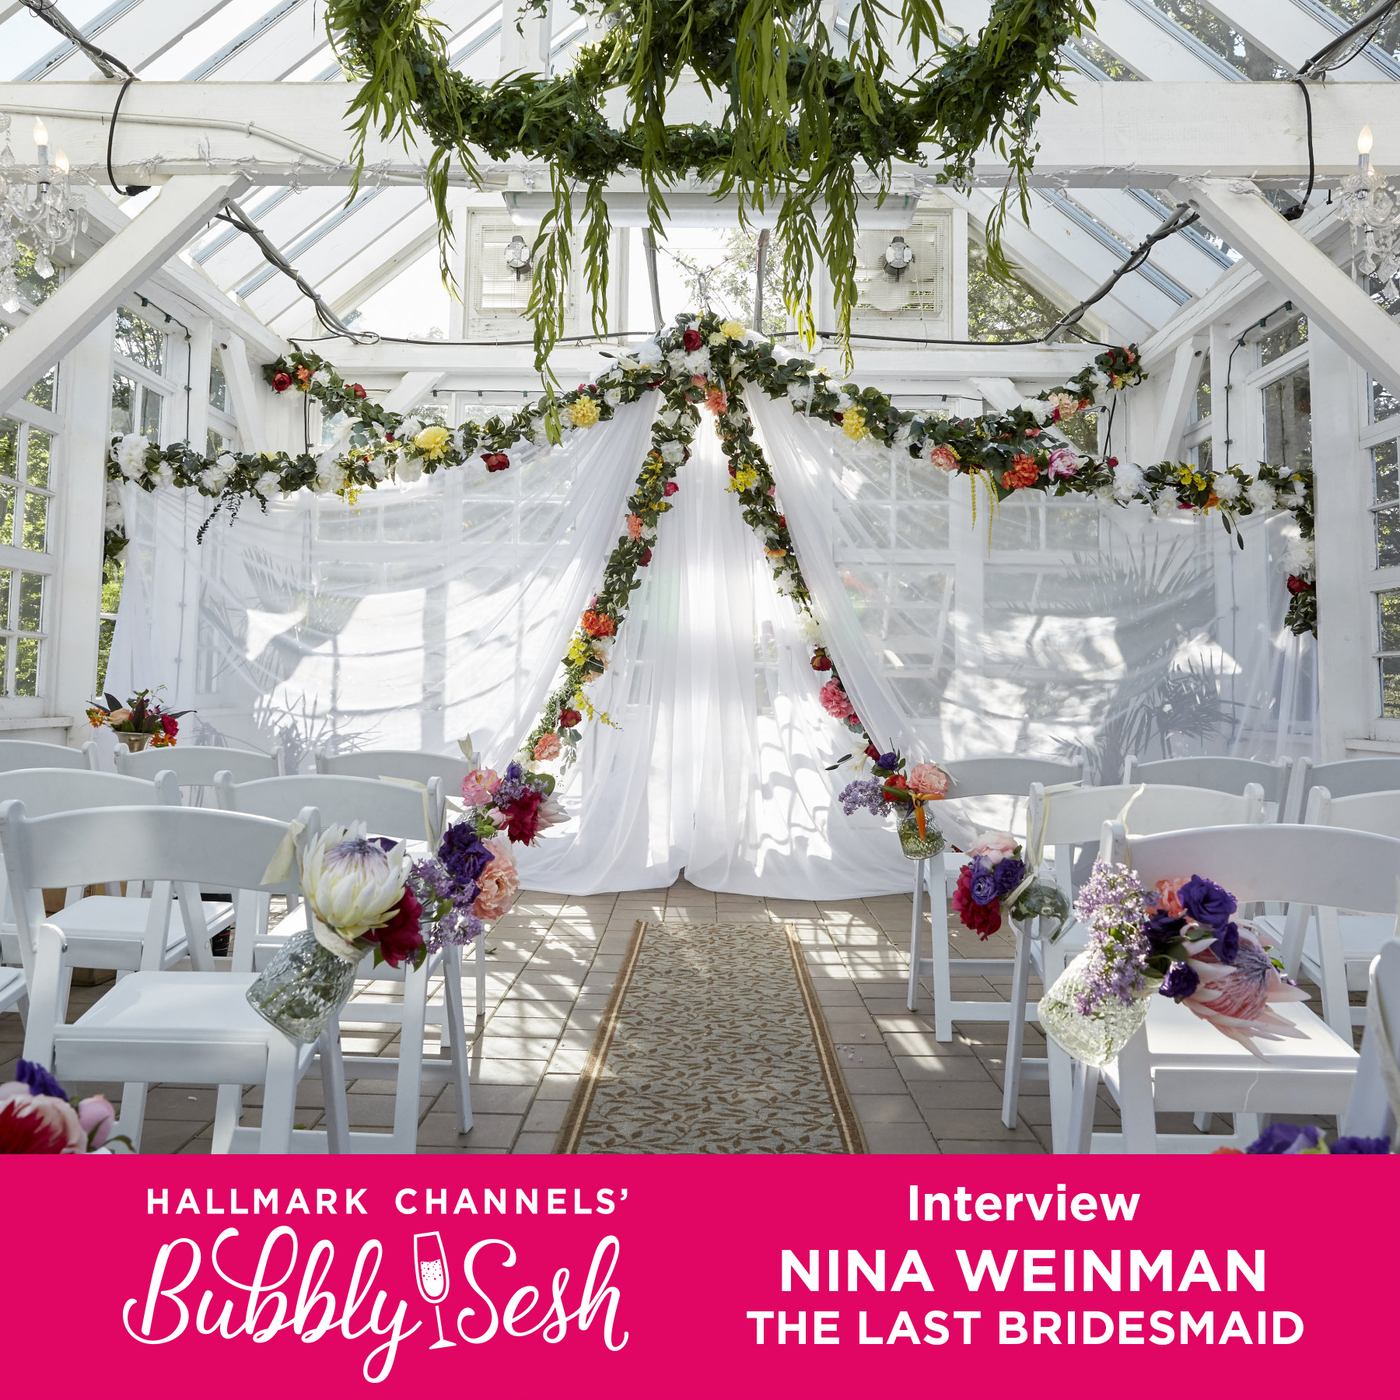 Nina Weinman Interview: The Last Bridesmaid